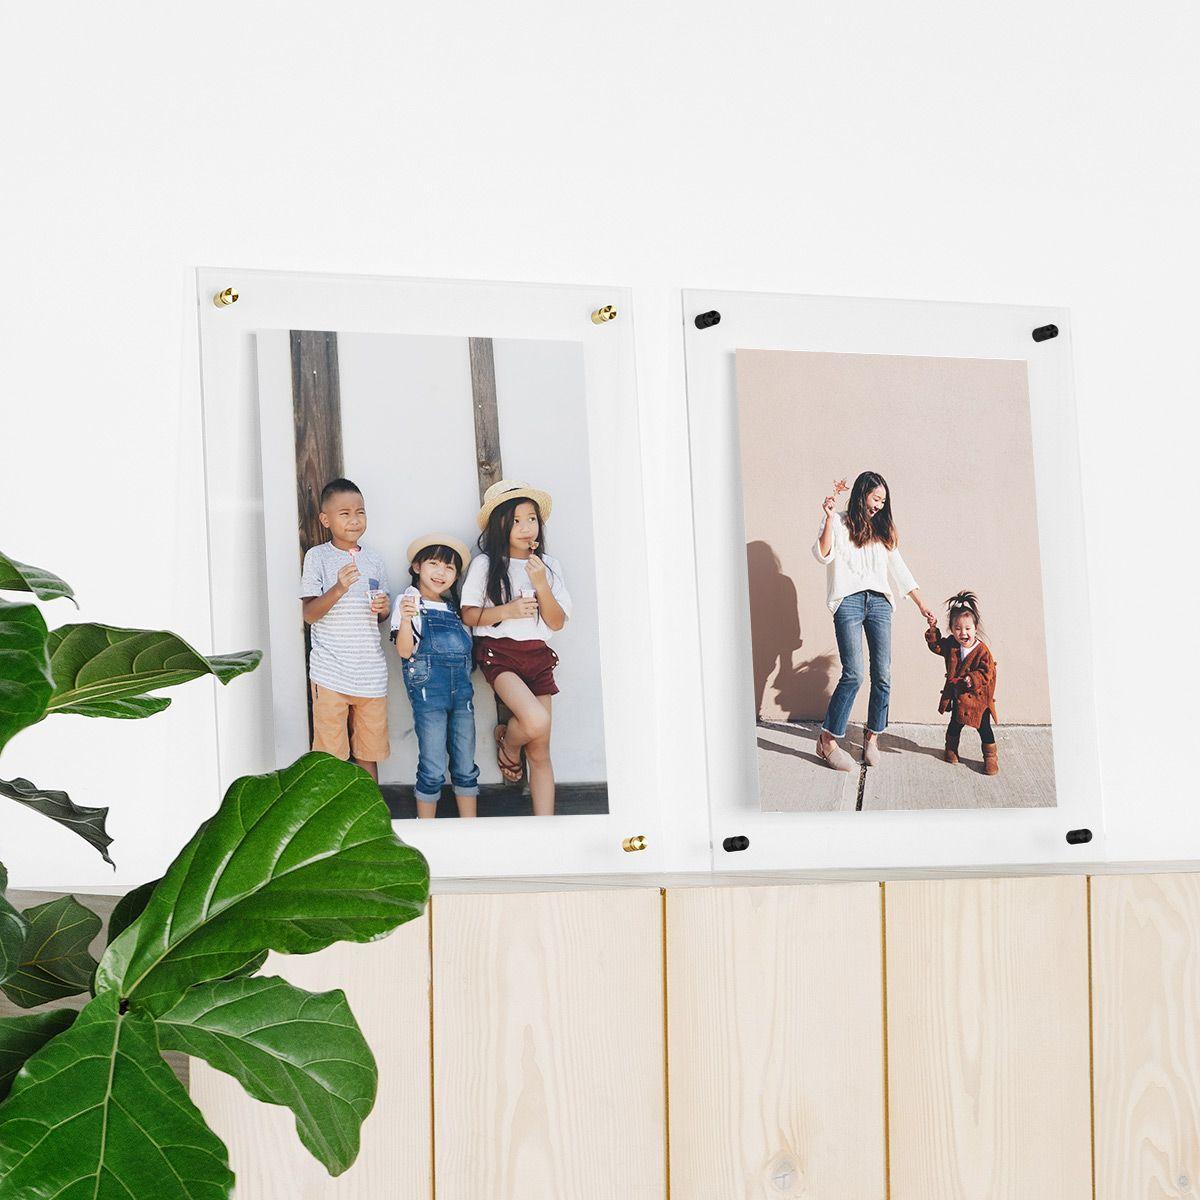 Acrylic Floating Frame By Artifact Uprising Floating Picture Frames Acrylic Picture Frames Floating Frame